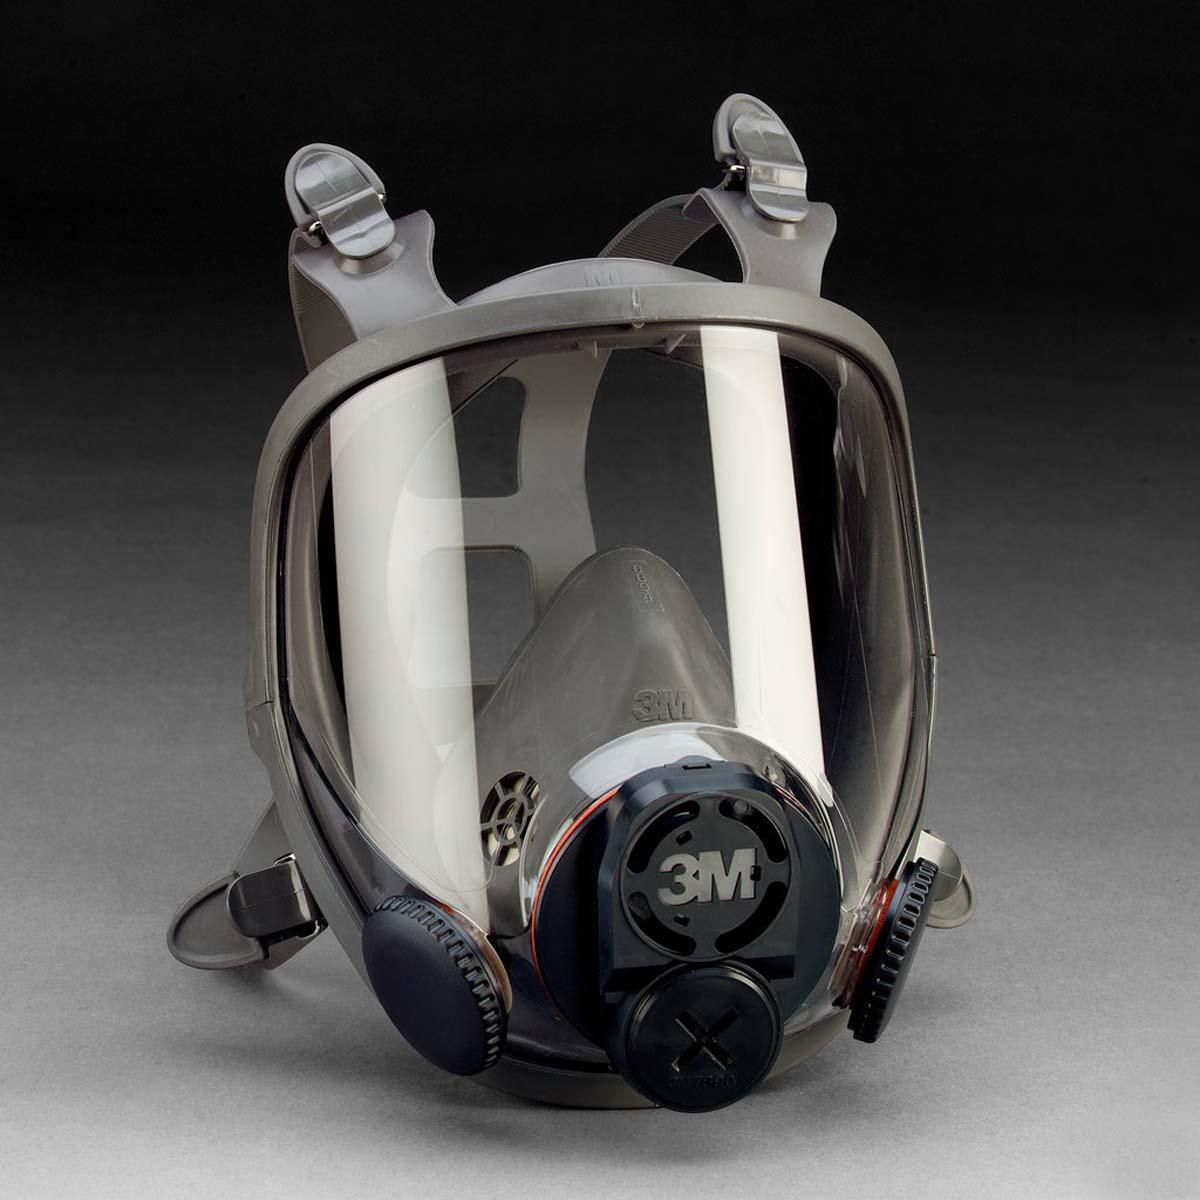 "3Mâ""¢ Full Facepiece Reusable Respirator 6800DIN Medium"